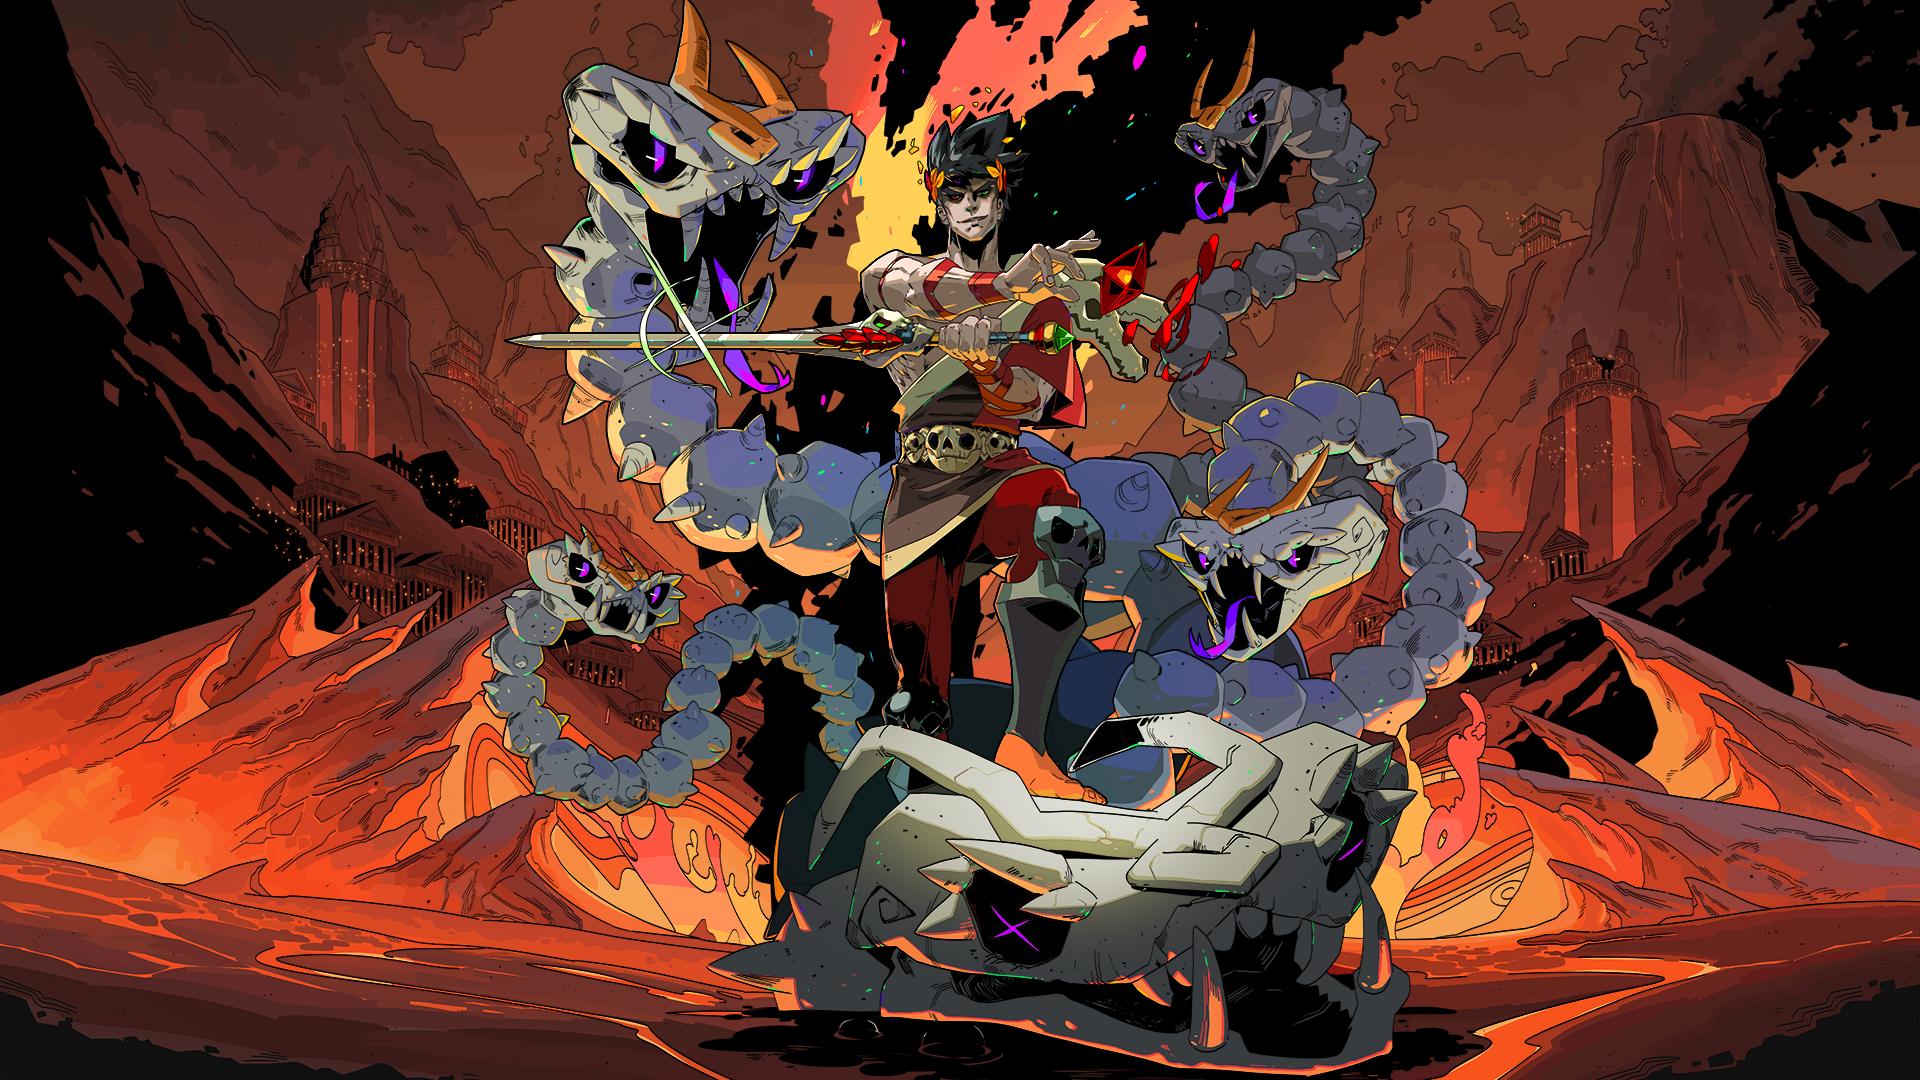 Hades - Cover Art